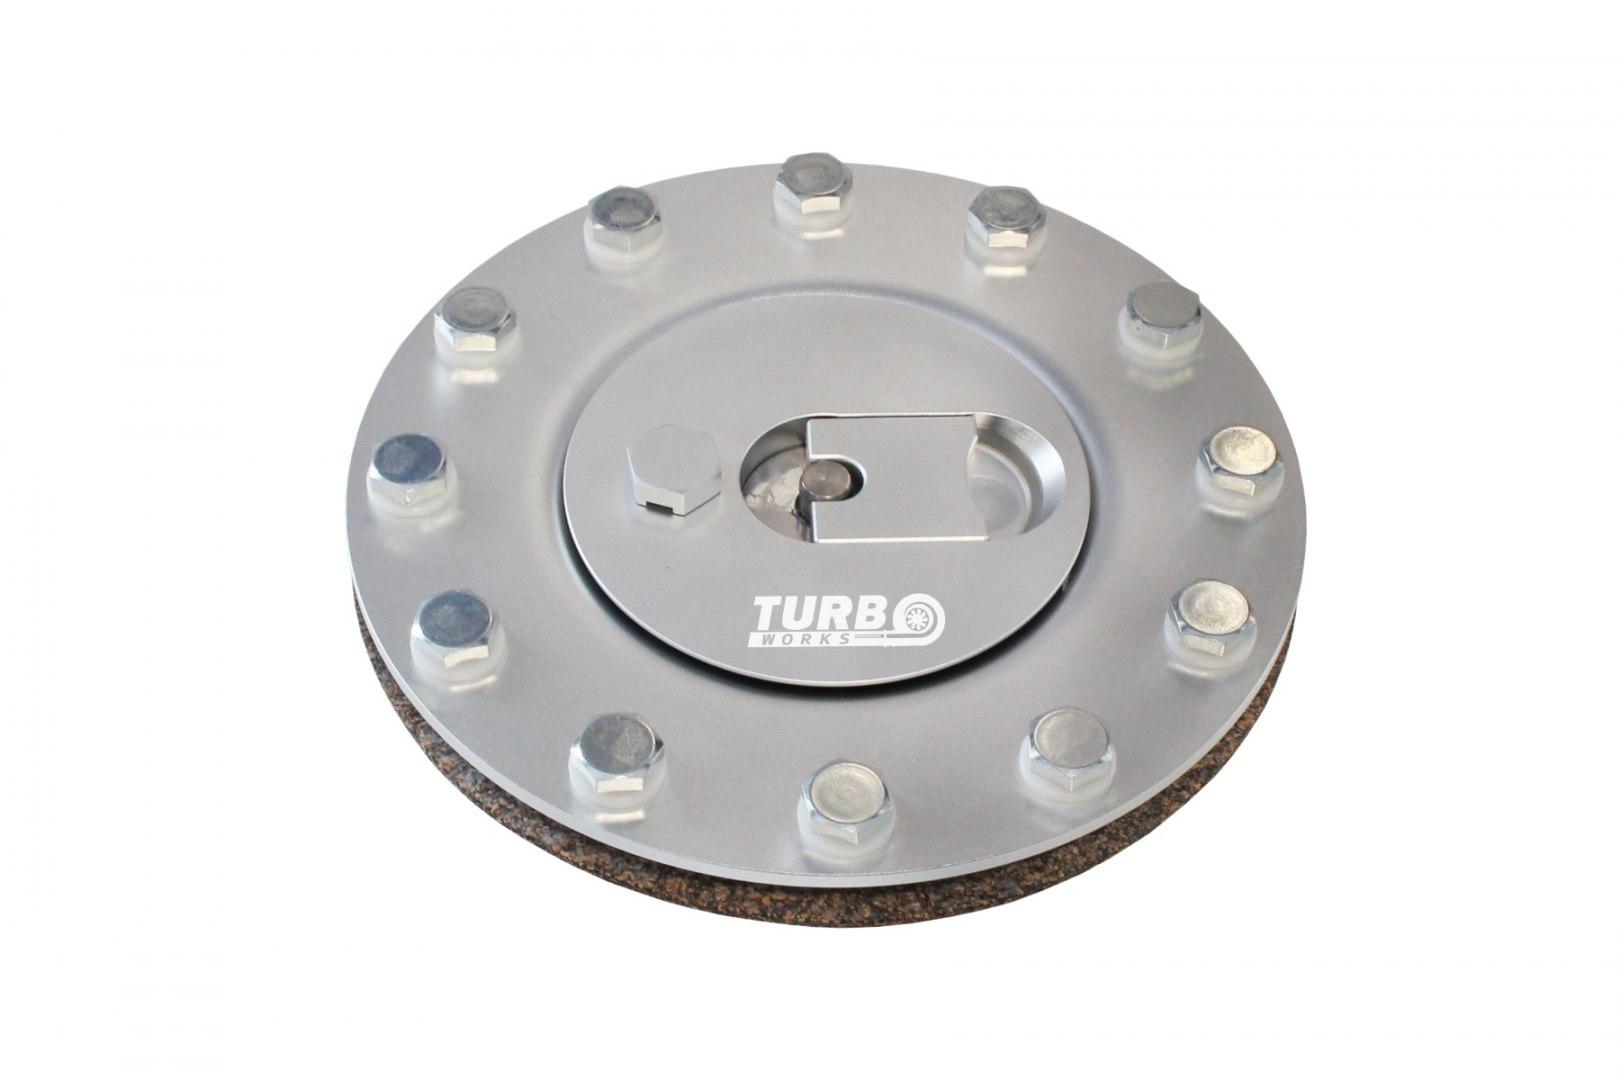 Wlew Zbiornika Paliwa Aluminiowy Srebrny - GRUBYGARAGE - Sklep Tuningowy